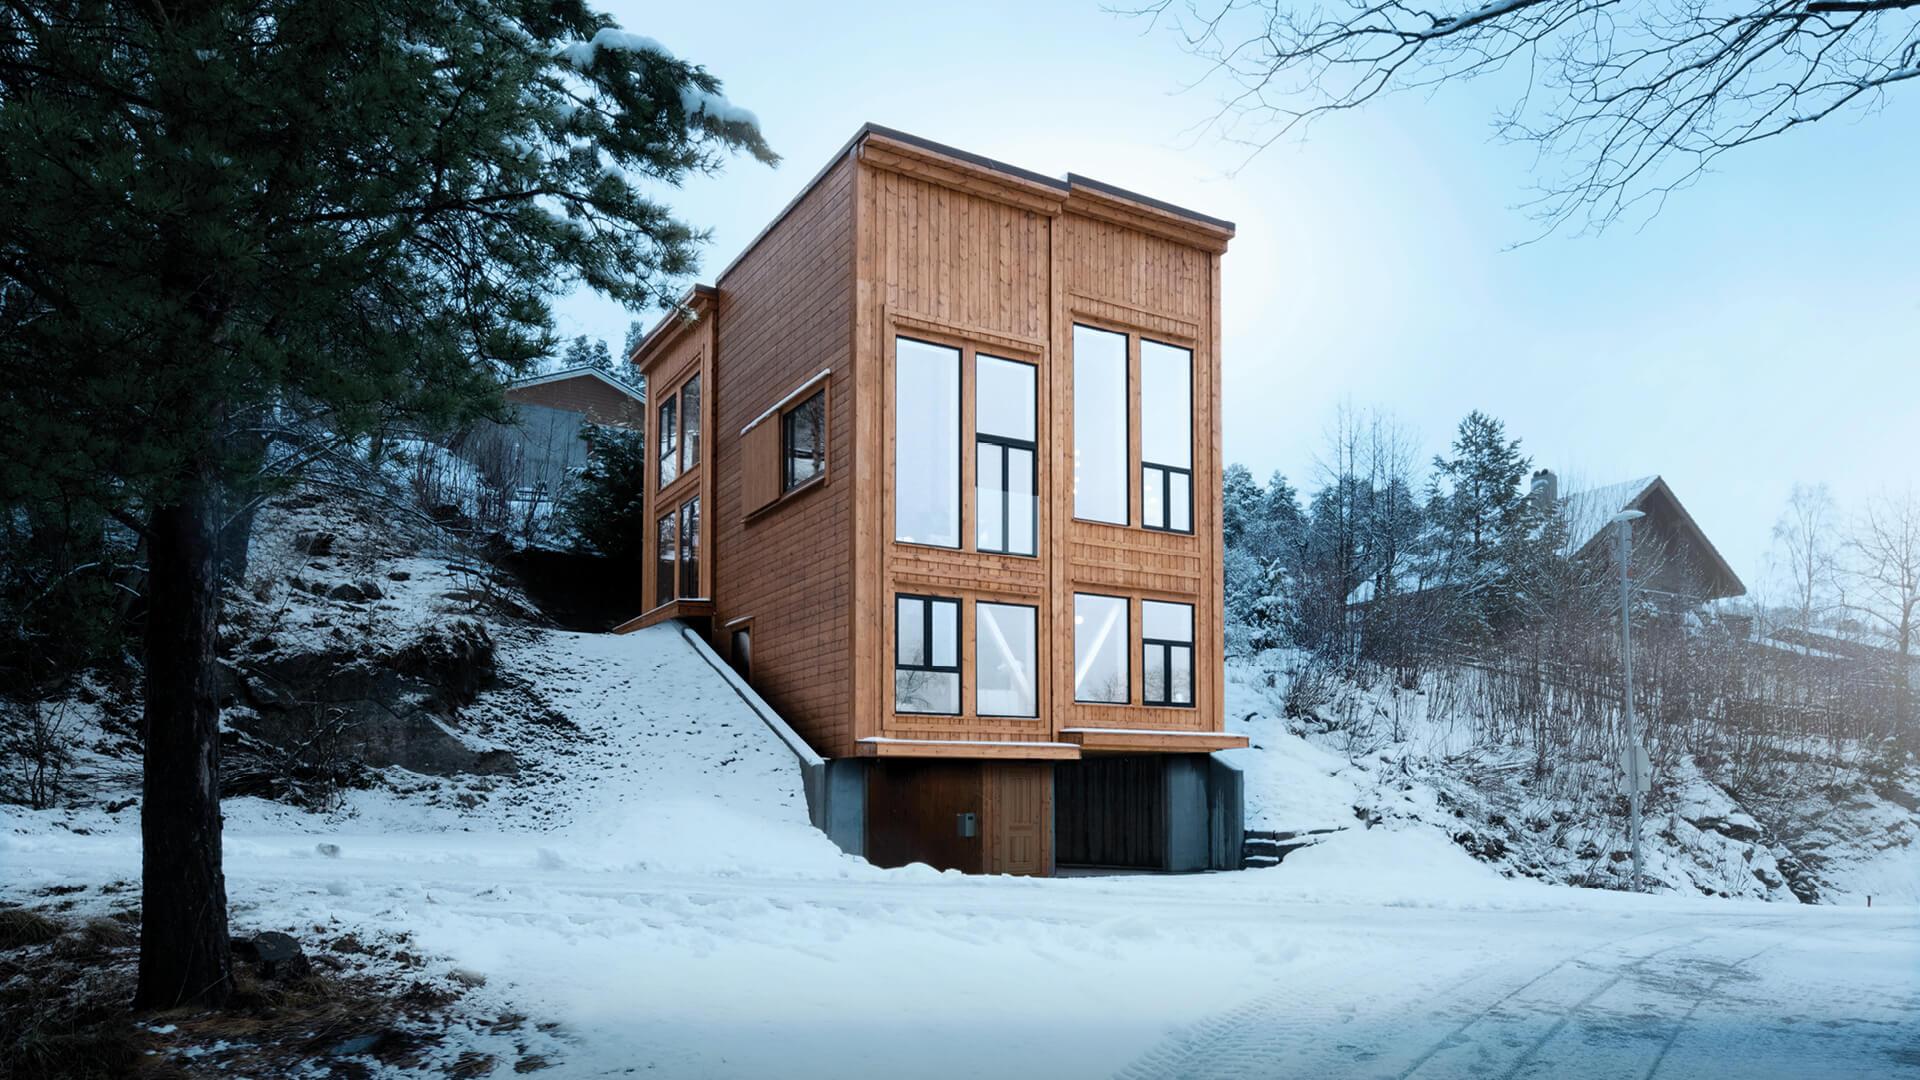 Zieglers Nest | Rever & Drage Architects | STIRworld